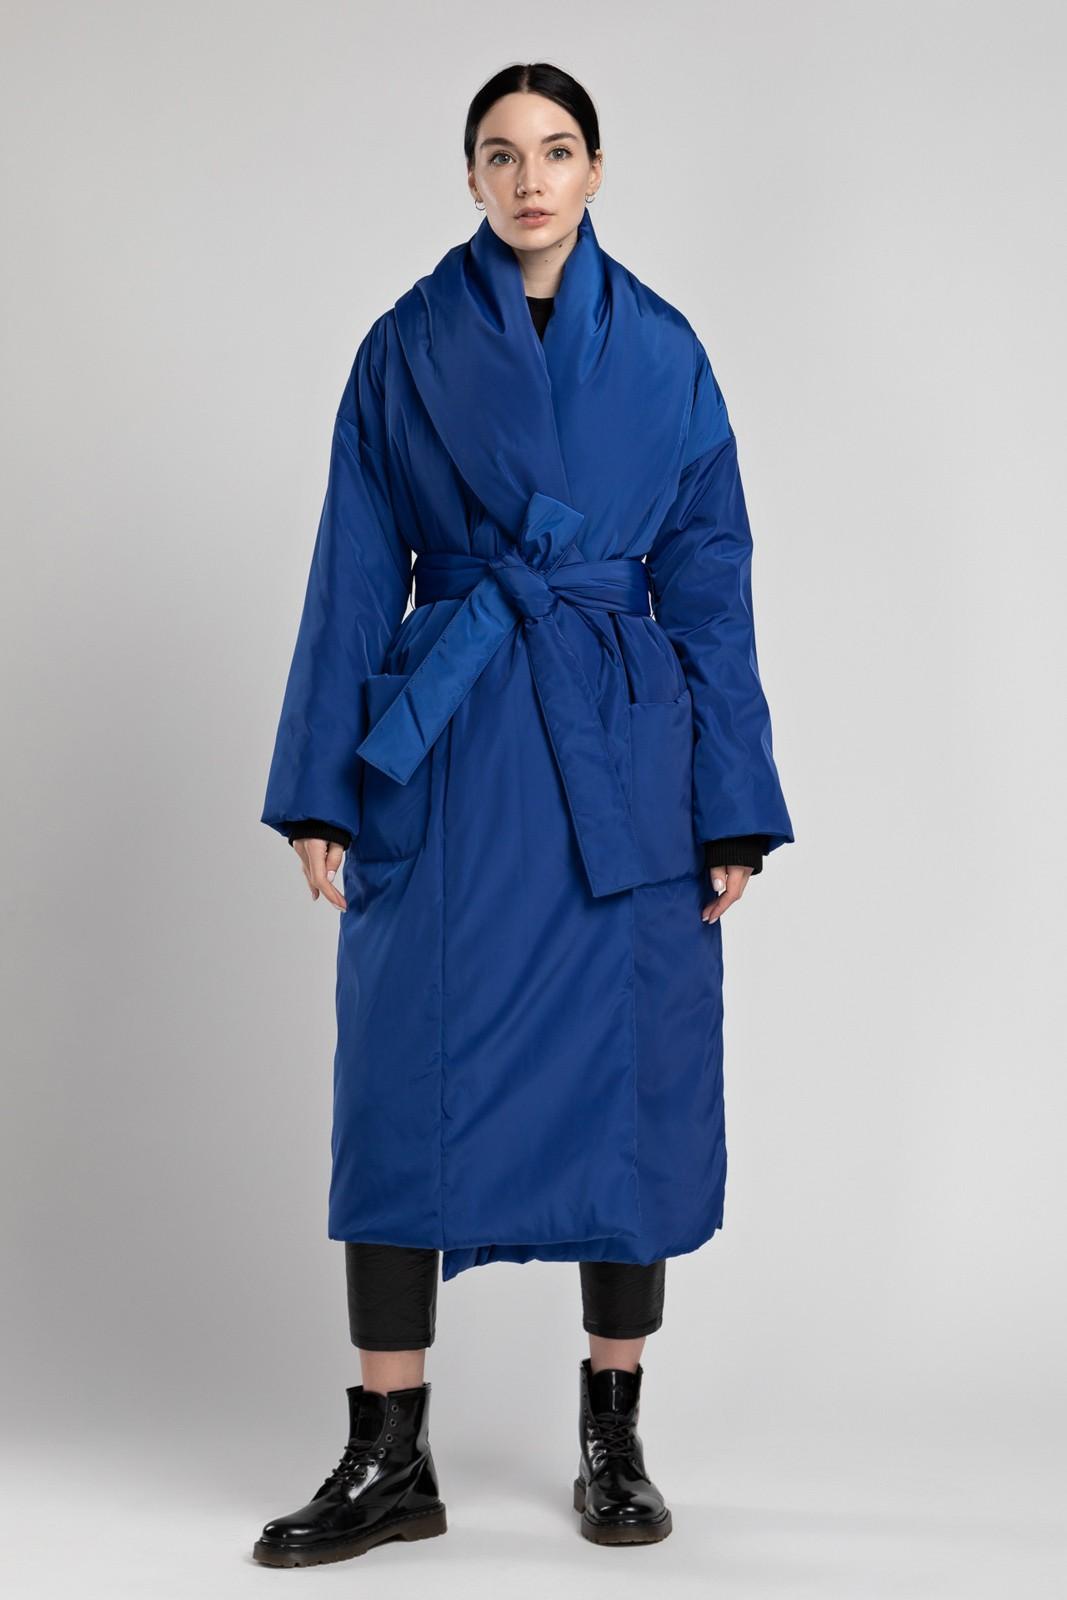 Пуховик-одеяло с шалевым воротником Azure PHM0120